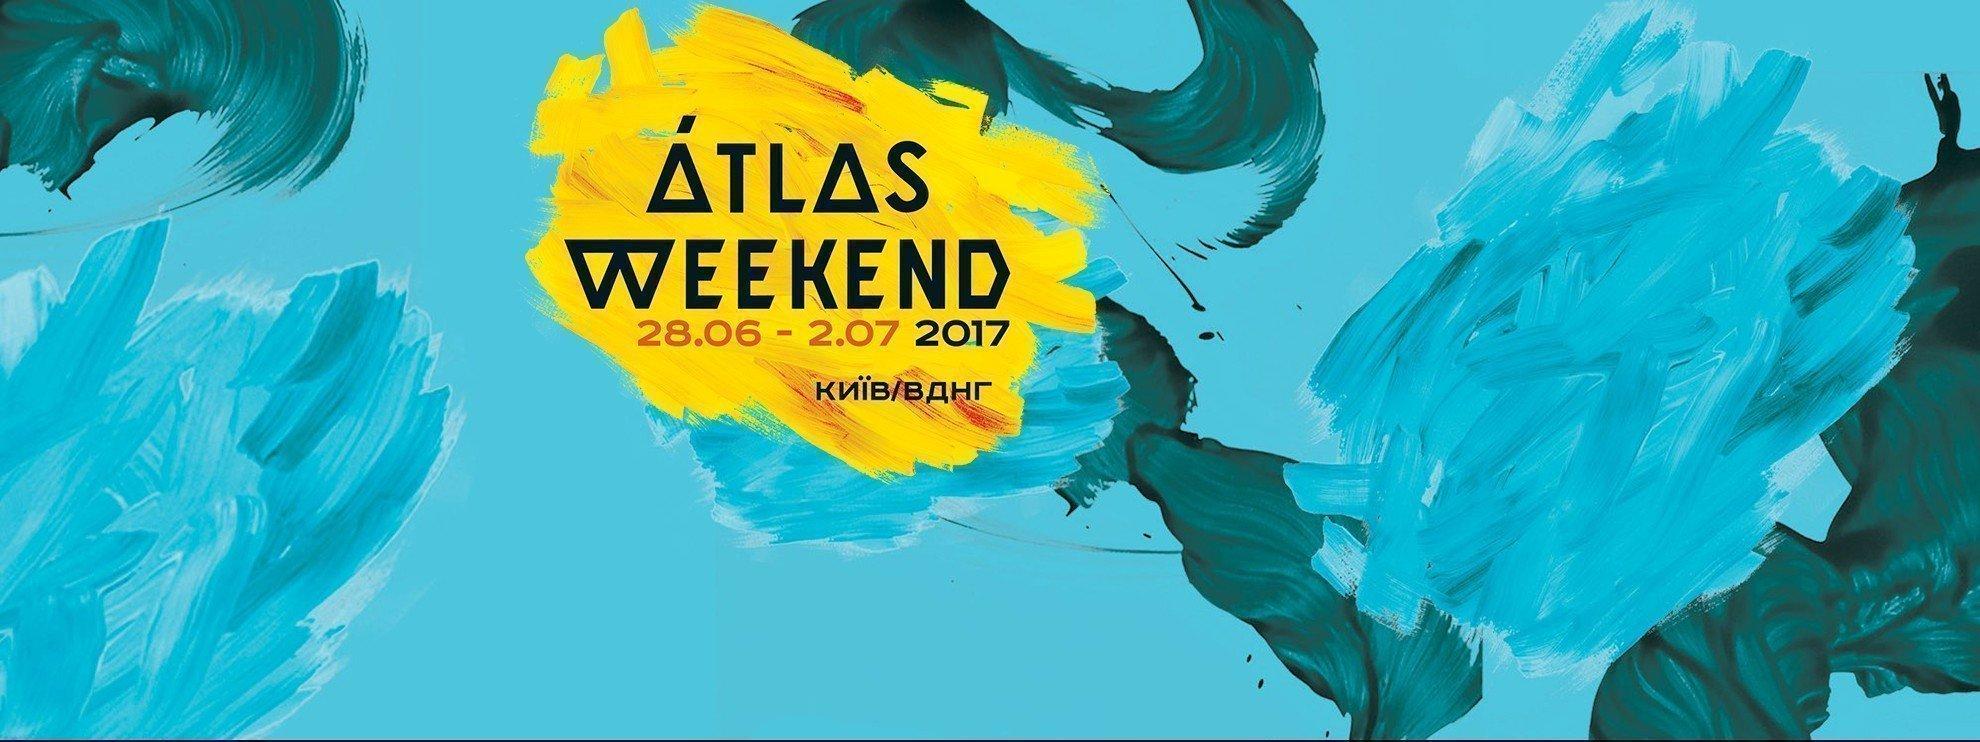 событие Atlas Weekend (Атлас Викенд)